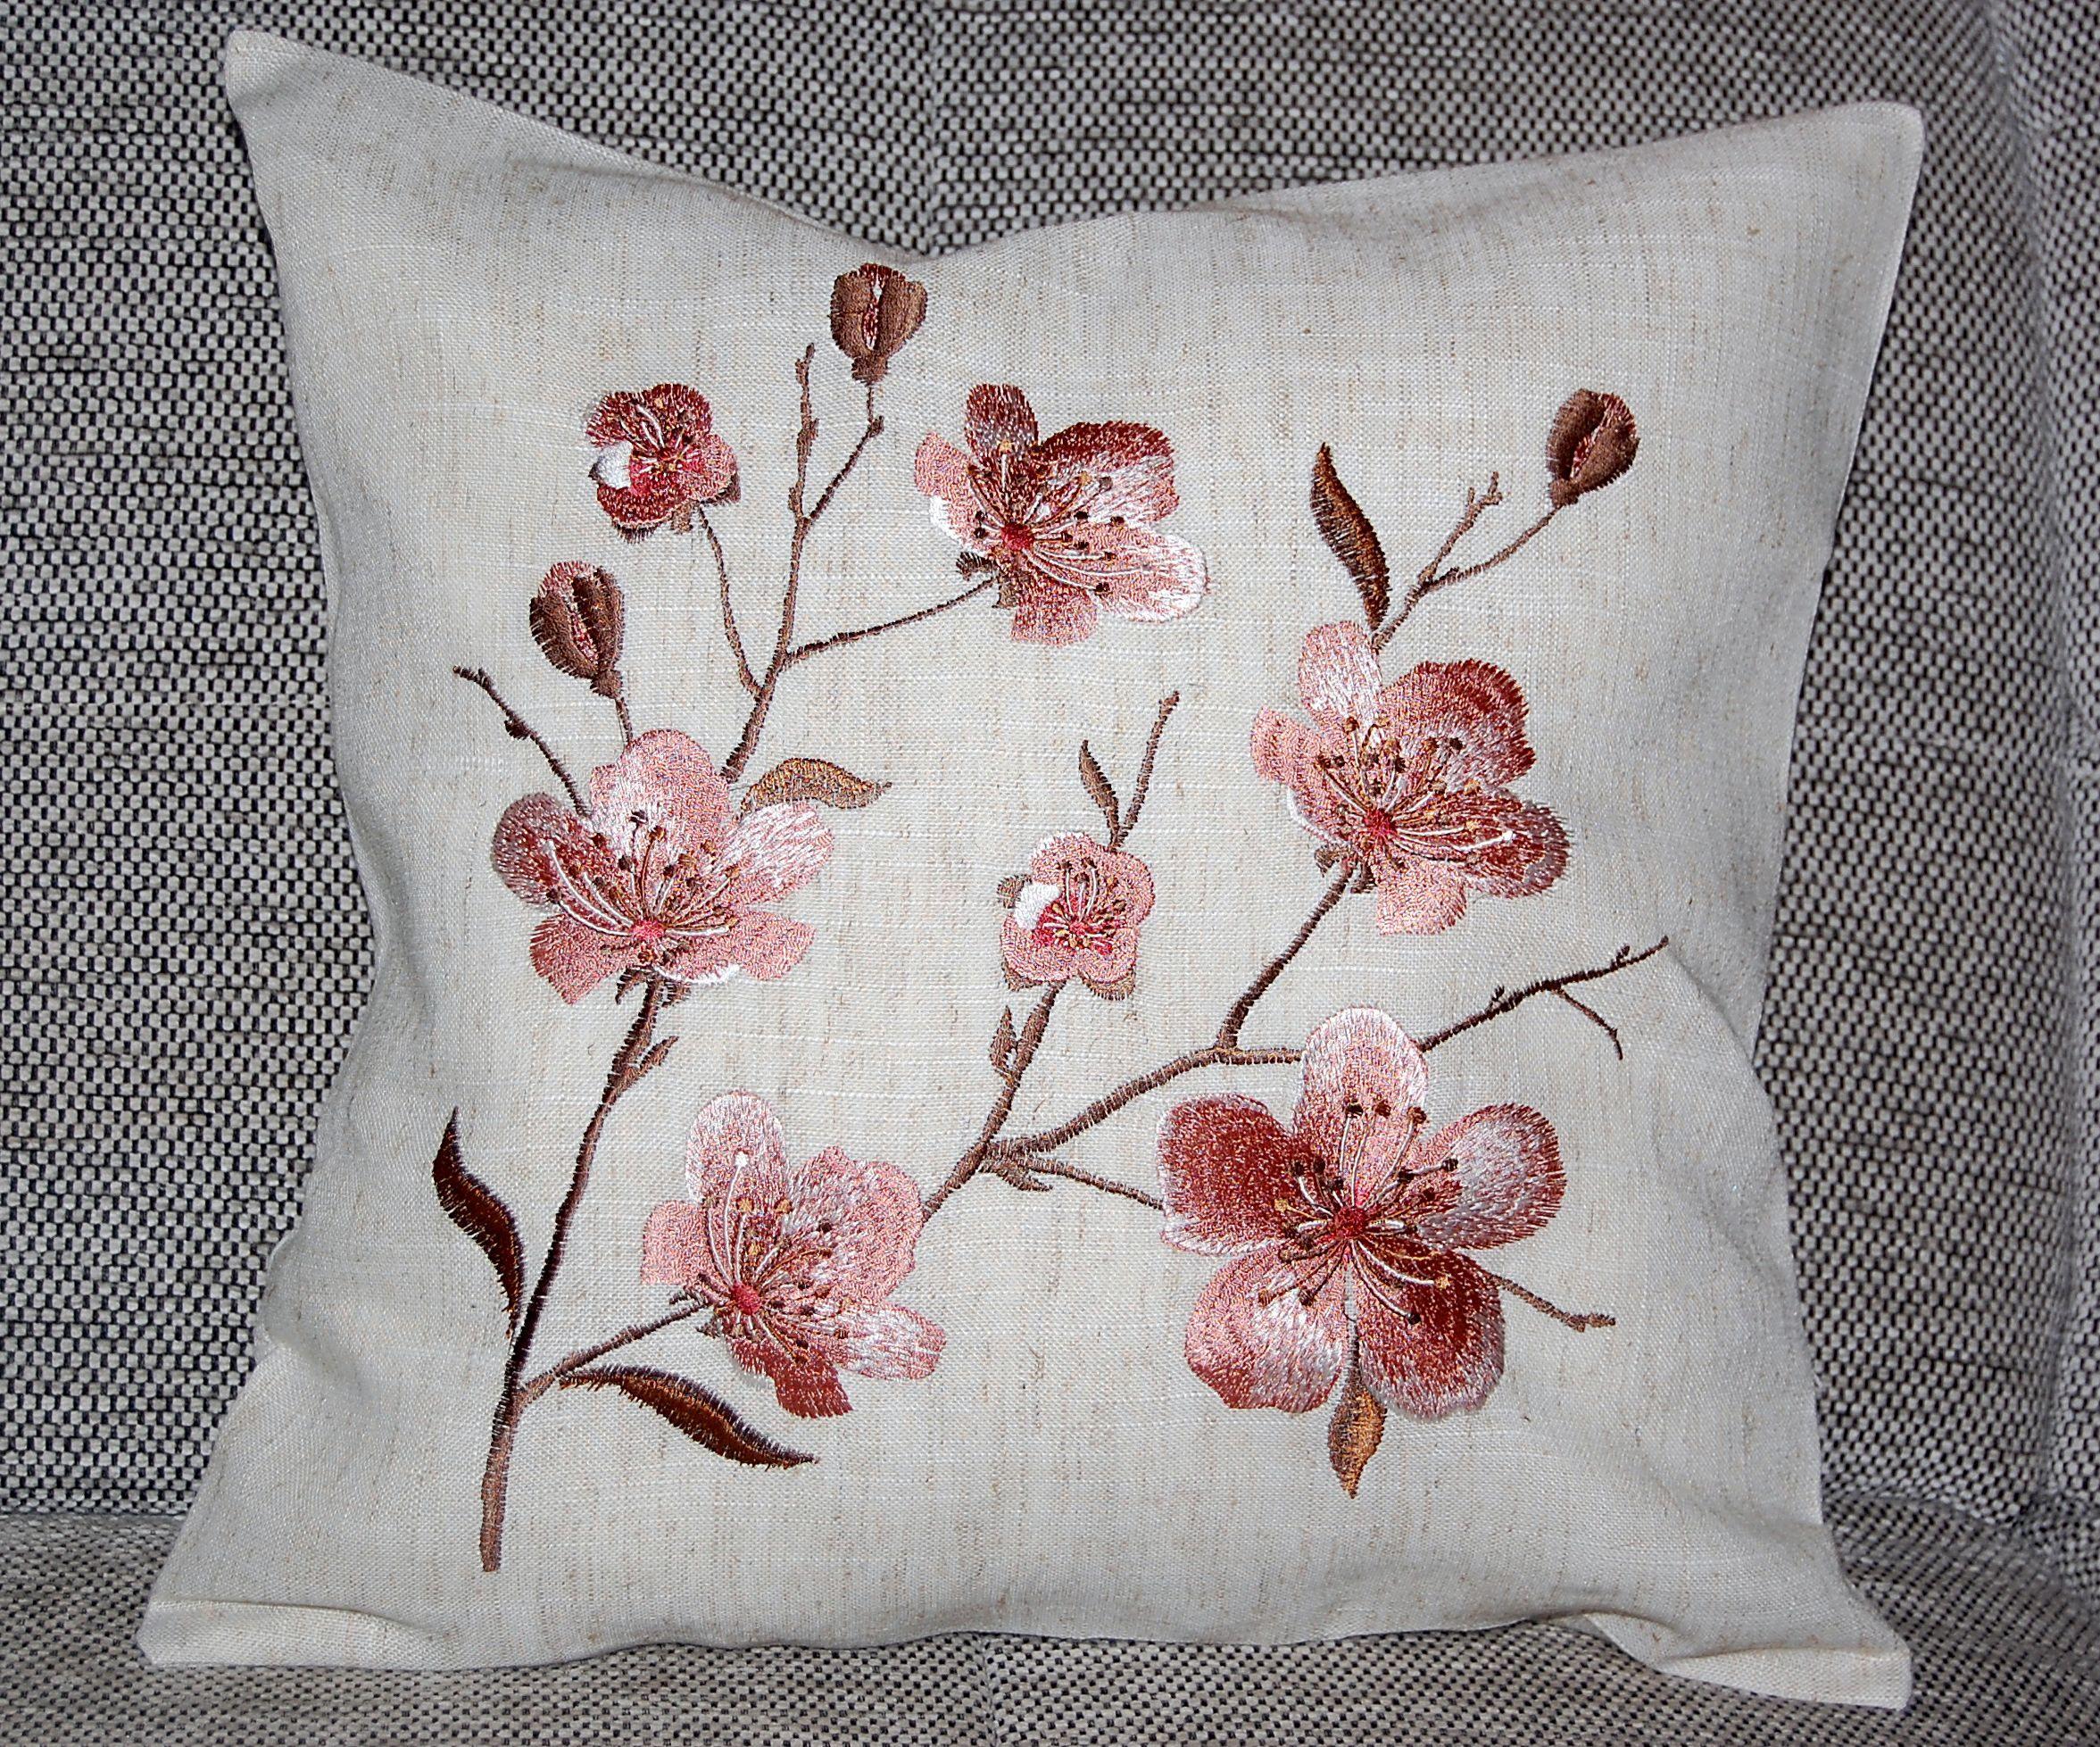 kissenh lle 40x40 cm natur leinenoptik romantik kissenbezug kissen kissenplatte ebay. Black Bedroom Furniture Sets. Home Design Ideas